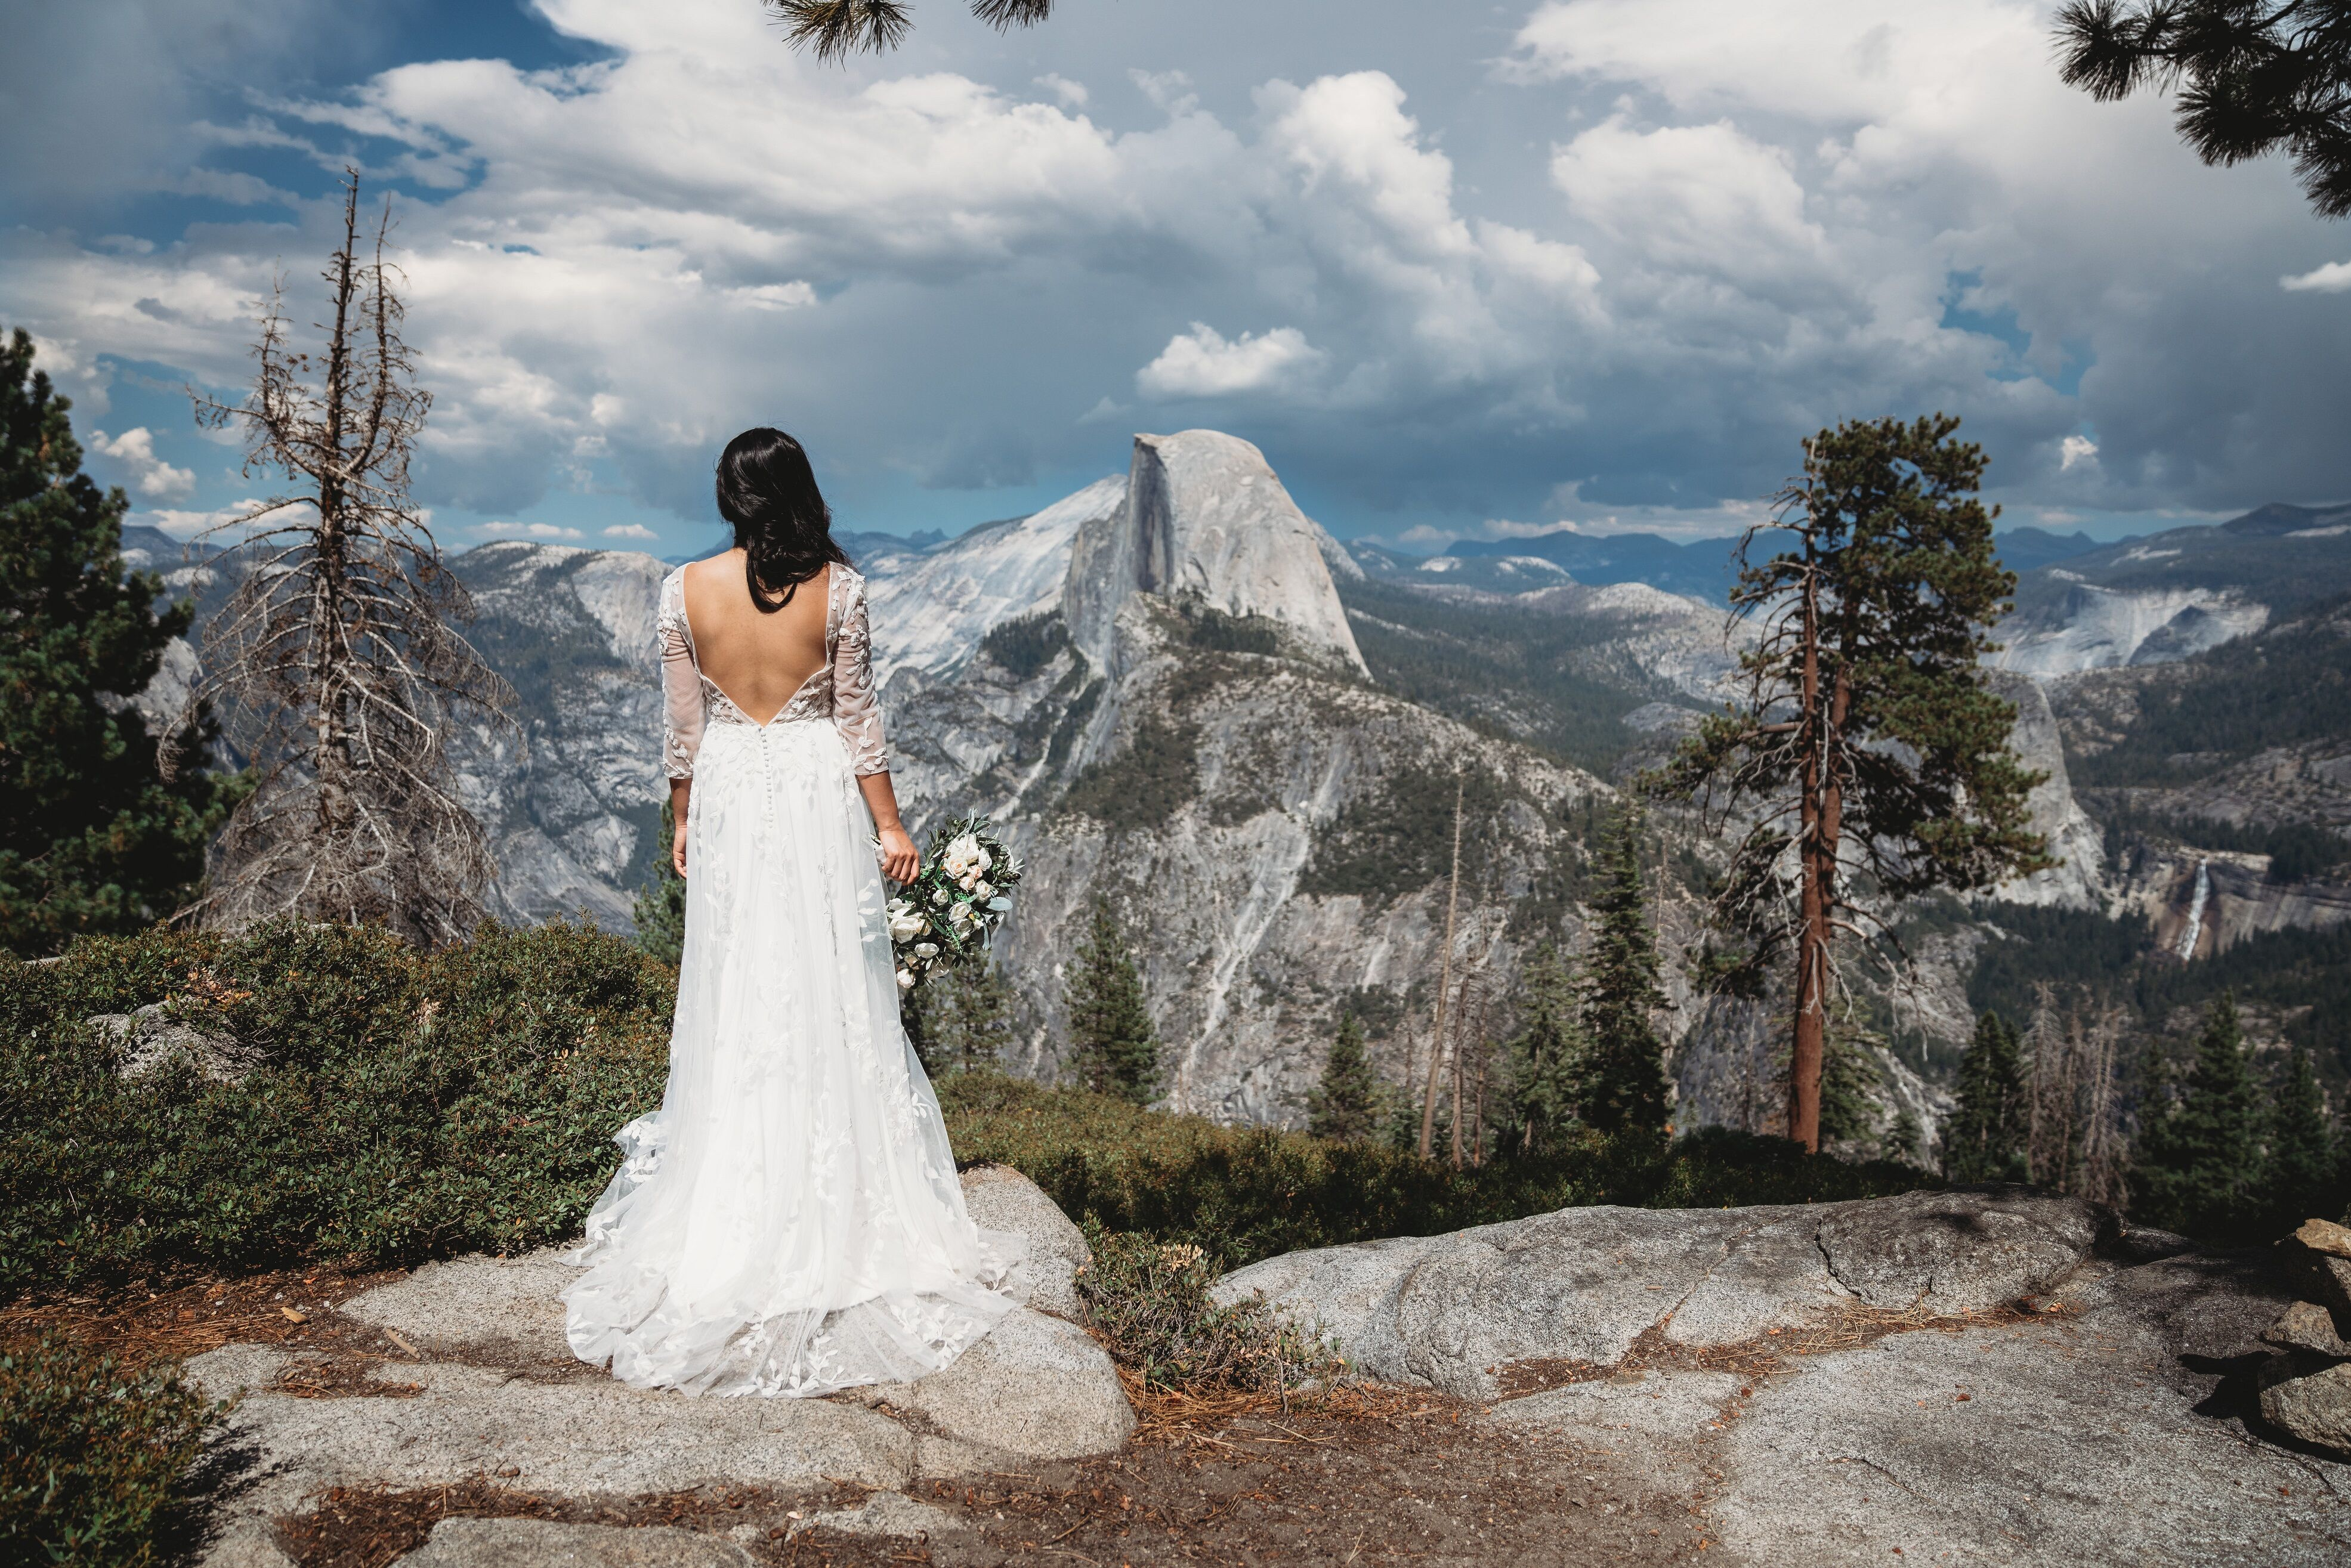 Wedding Photographers in Yuba City, CA   The Knot